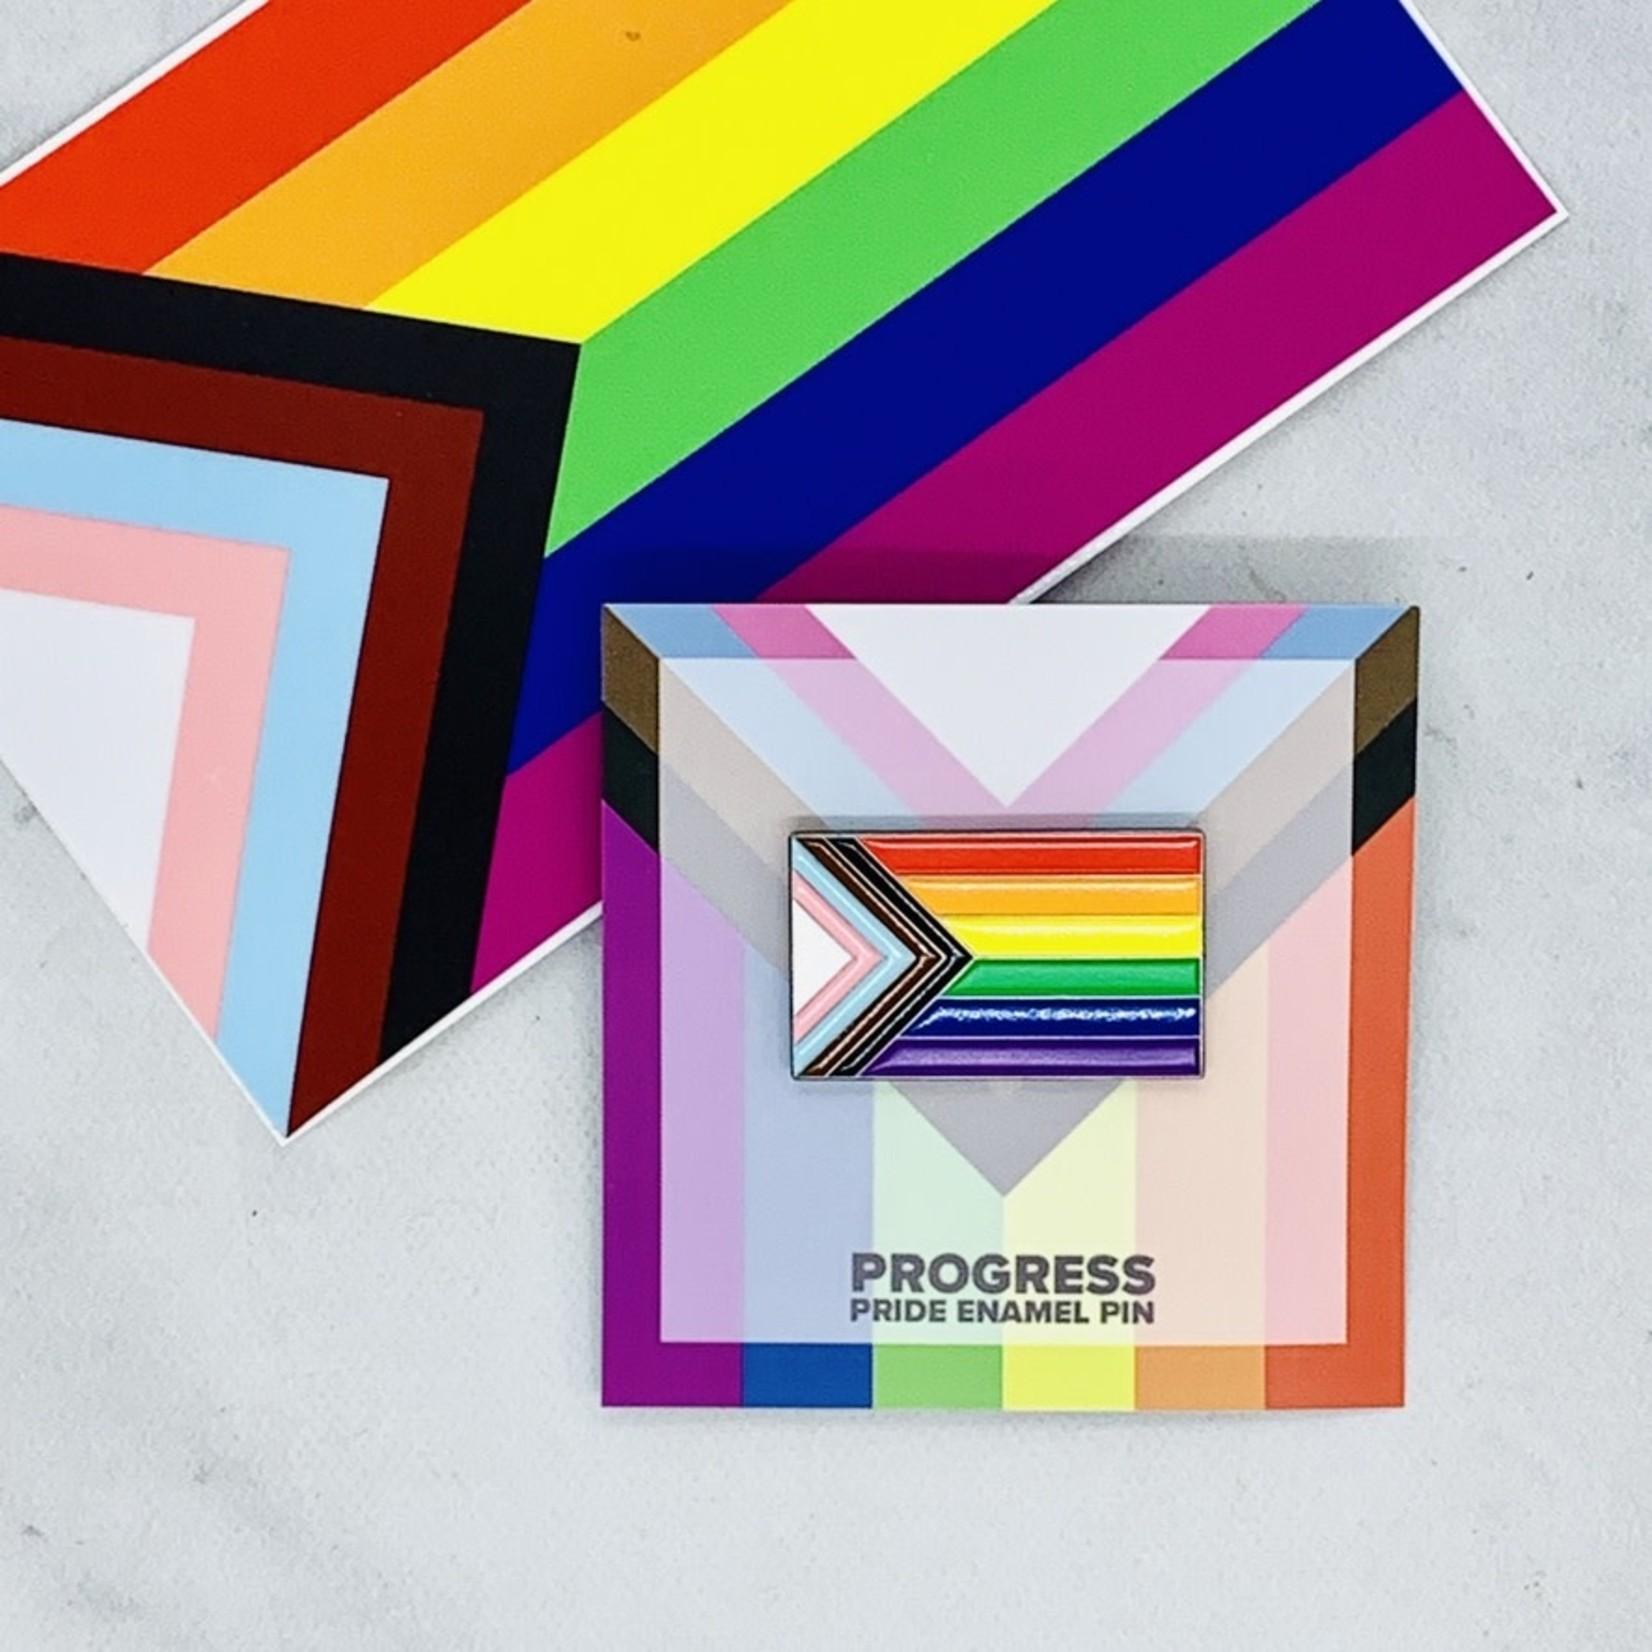 Flags for Good Progress Enamel Pin